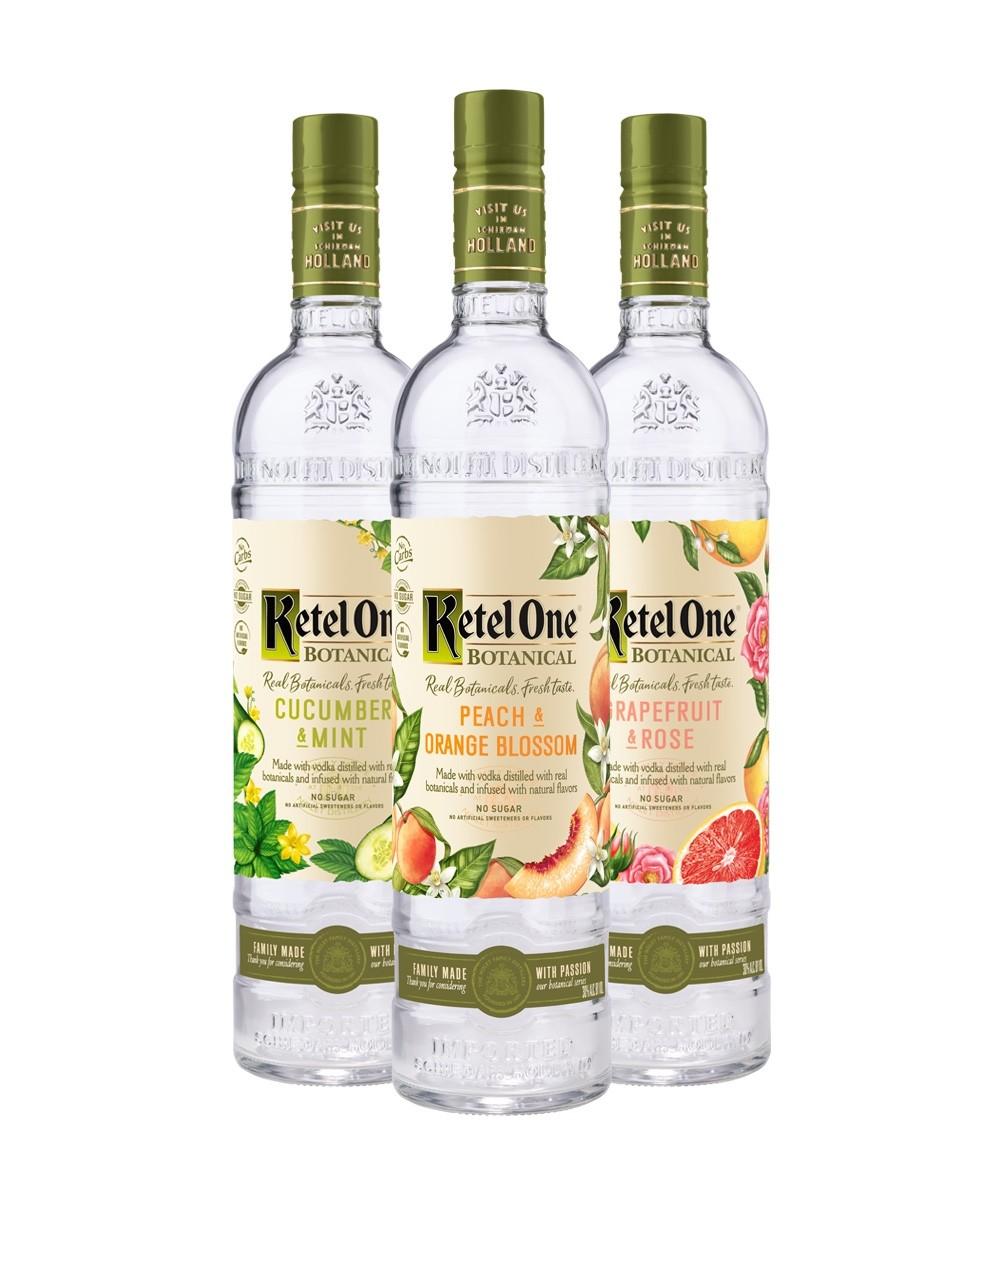 Ketel One Botanical Collection 3 Bottles  Buy Online or